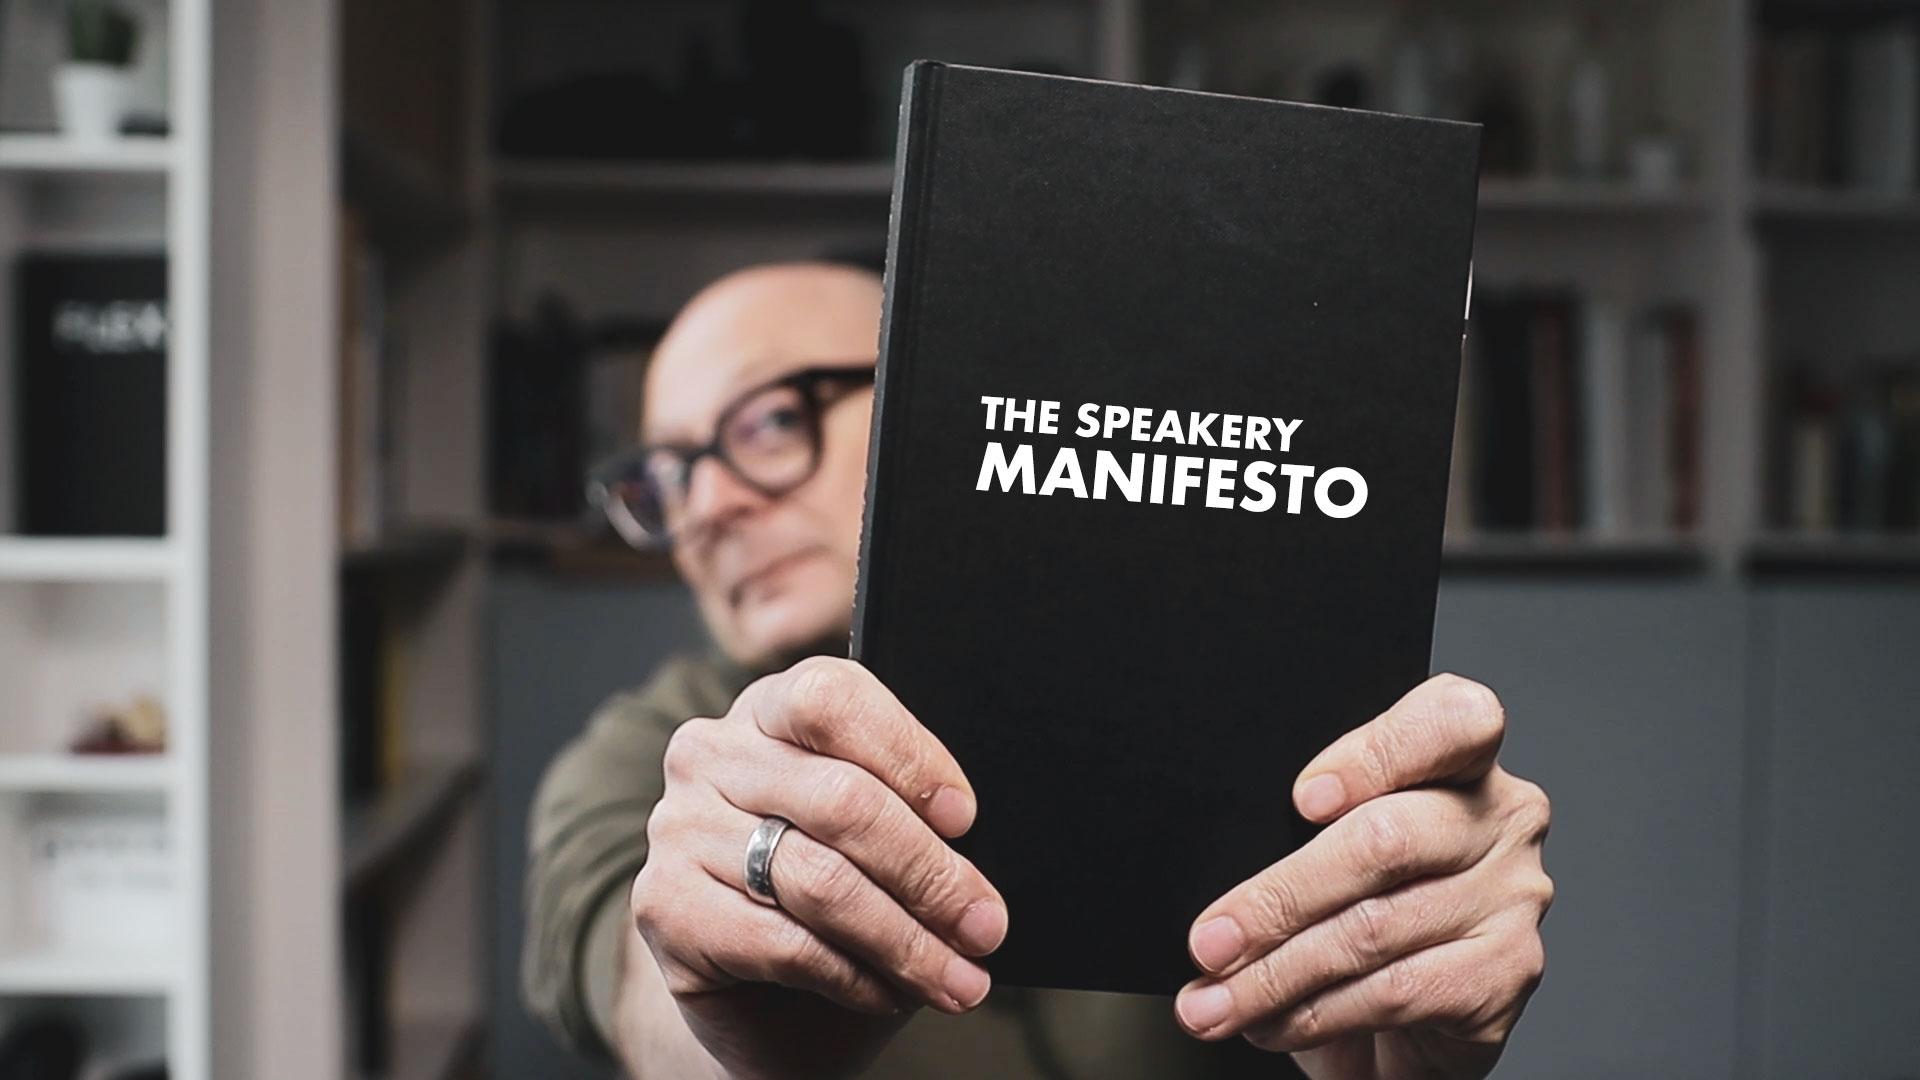 The Speakery Manifesto